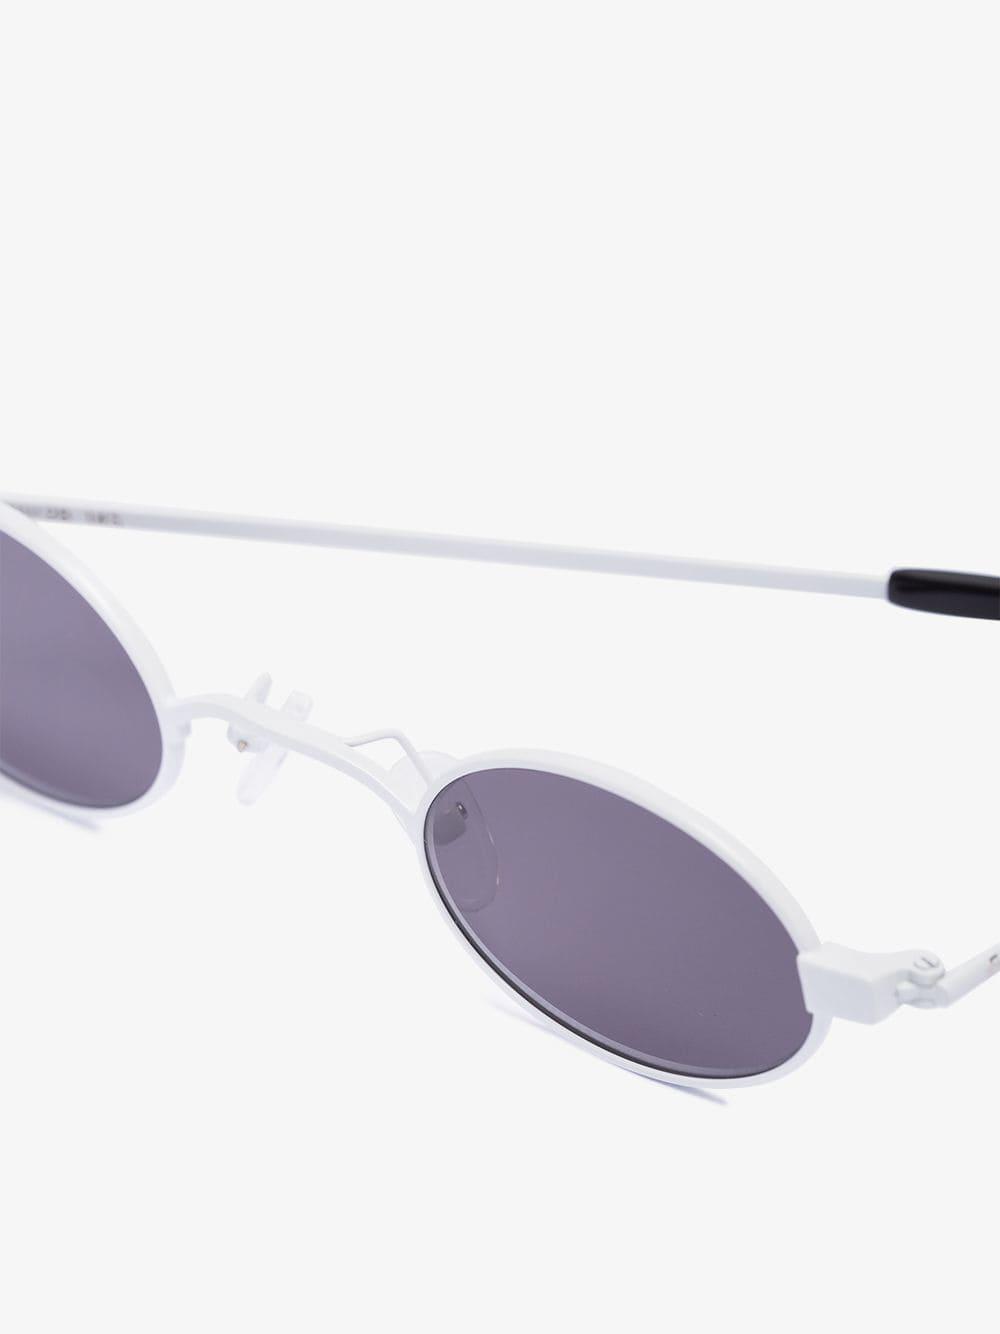 ROBERI AND FRAUD Rubber White Doris Sunglasses